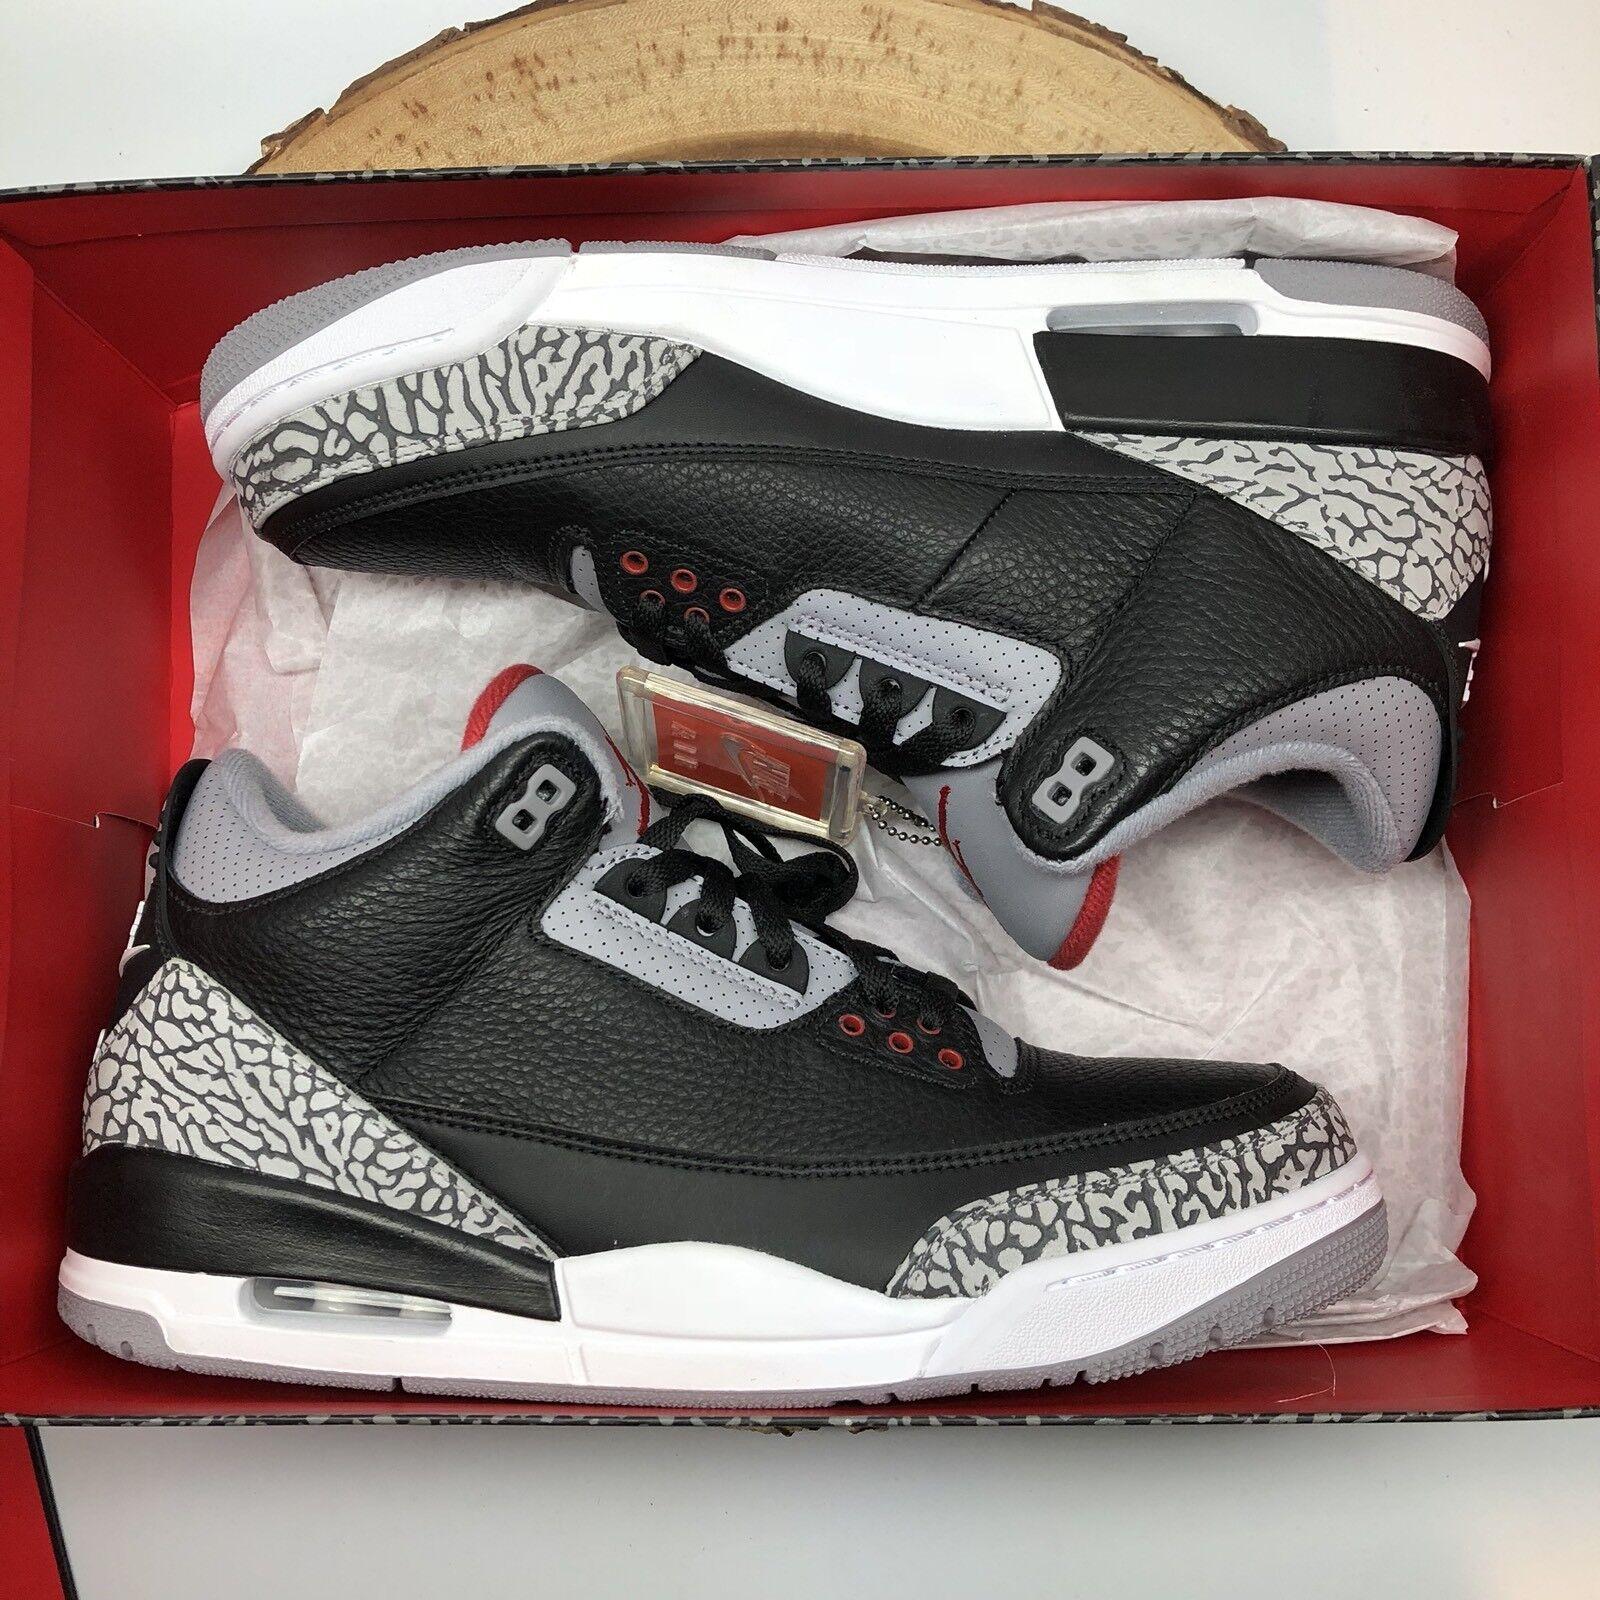 2018 Nike Air Jordan Retro 3 OG BC3 Black Cement 854262 001 Sz 10.5 White XI XII